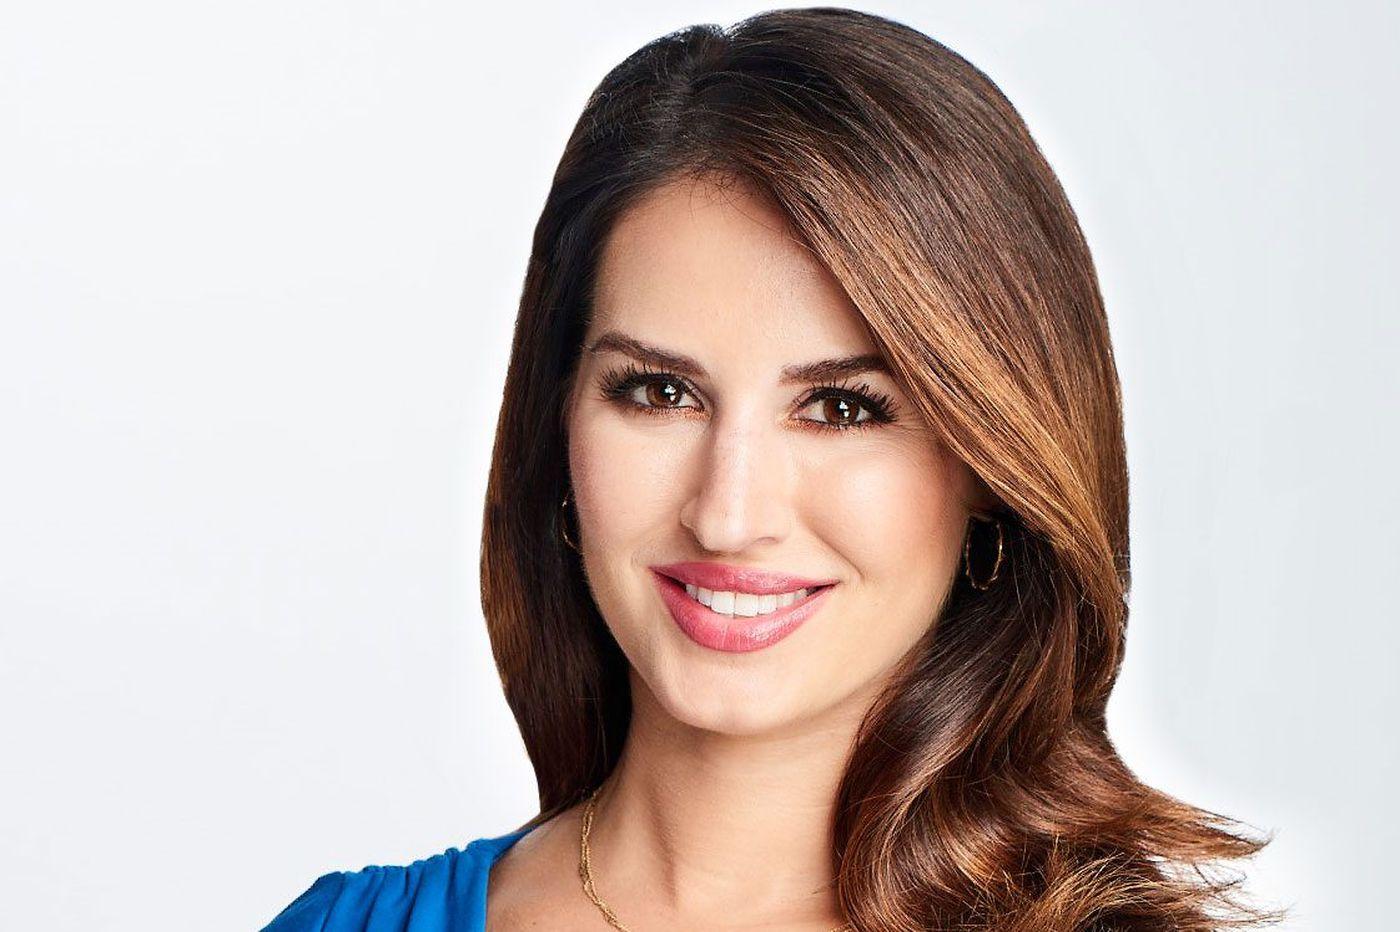 Sheena Parveen Net Worth 2020, Bio, Relationship, and Career Updates